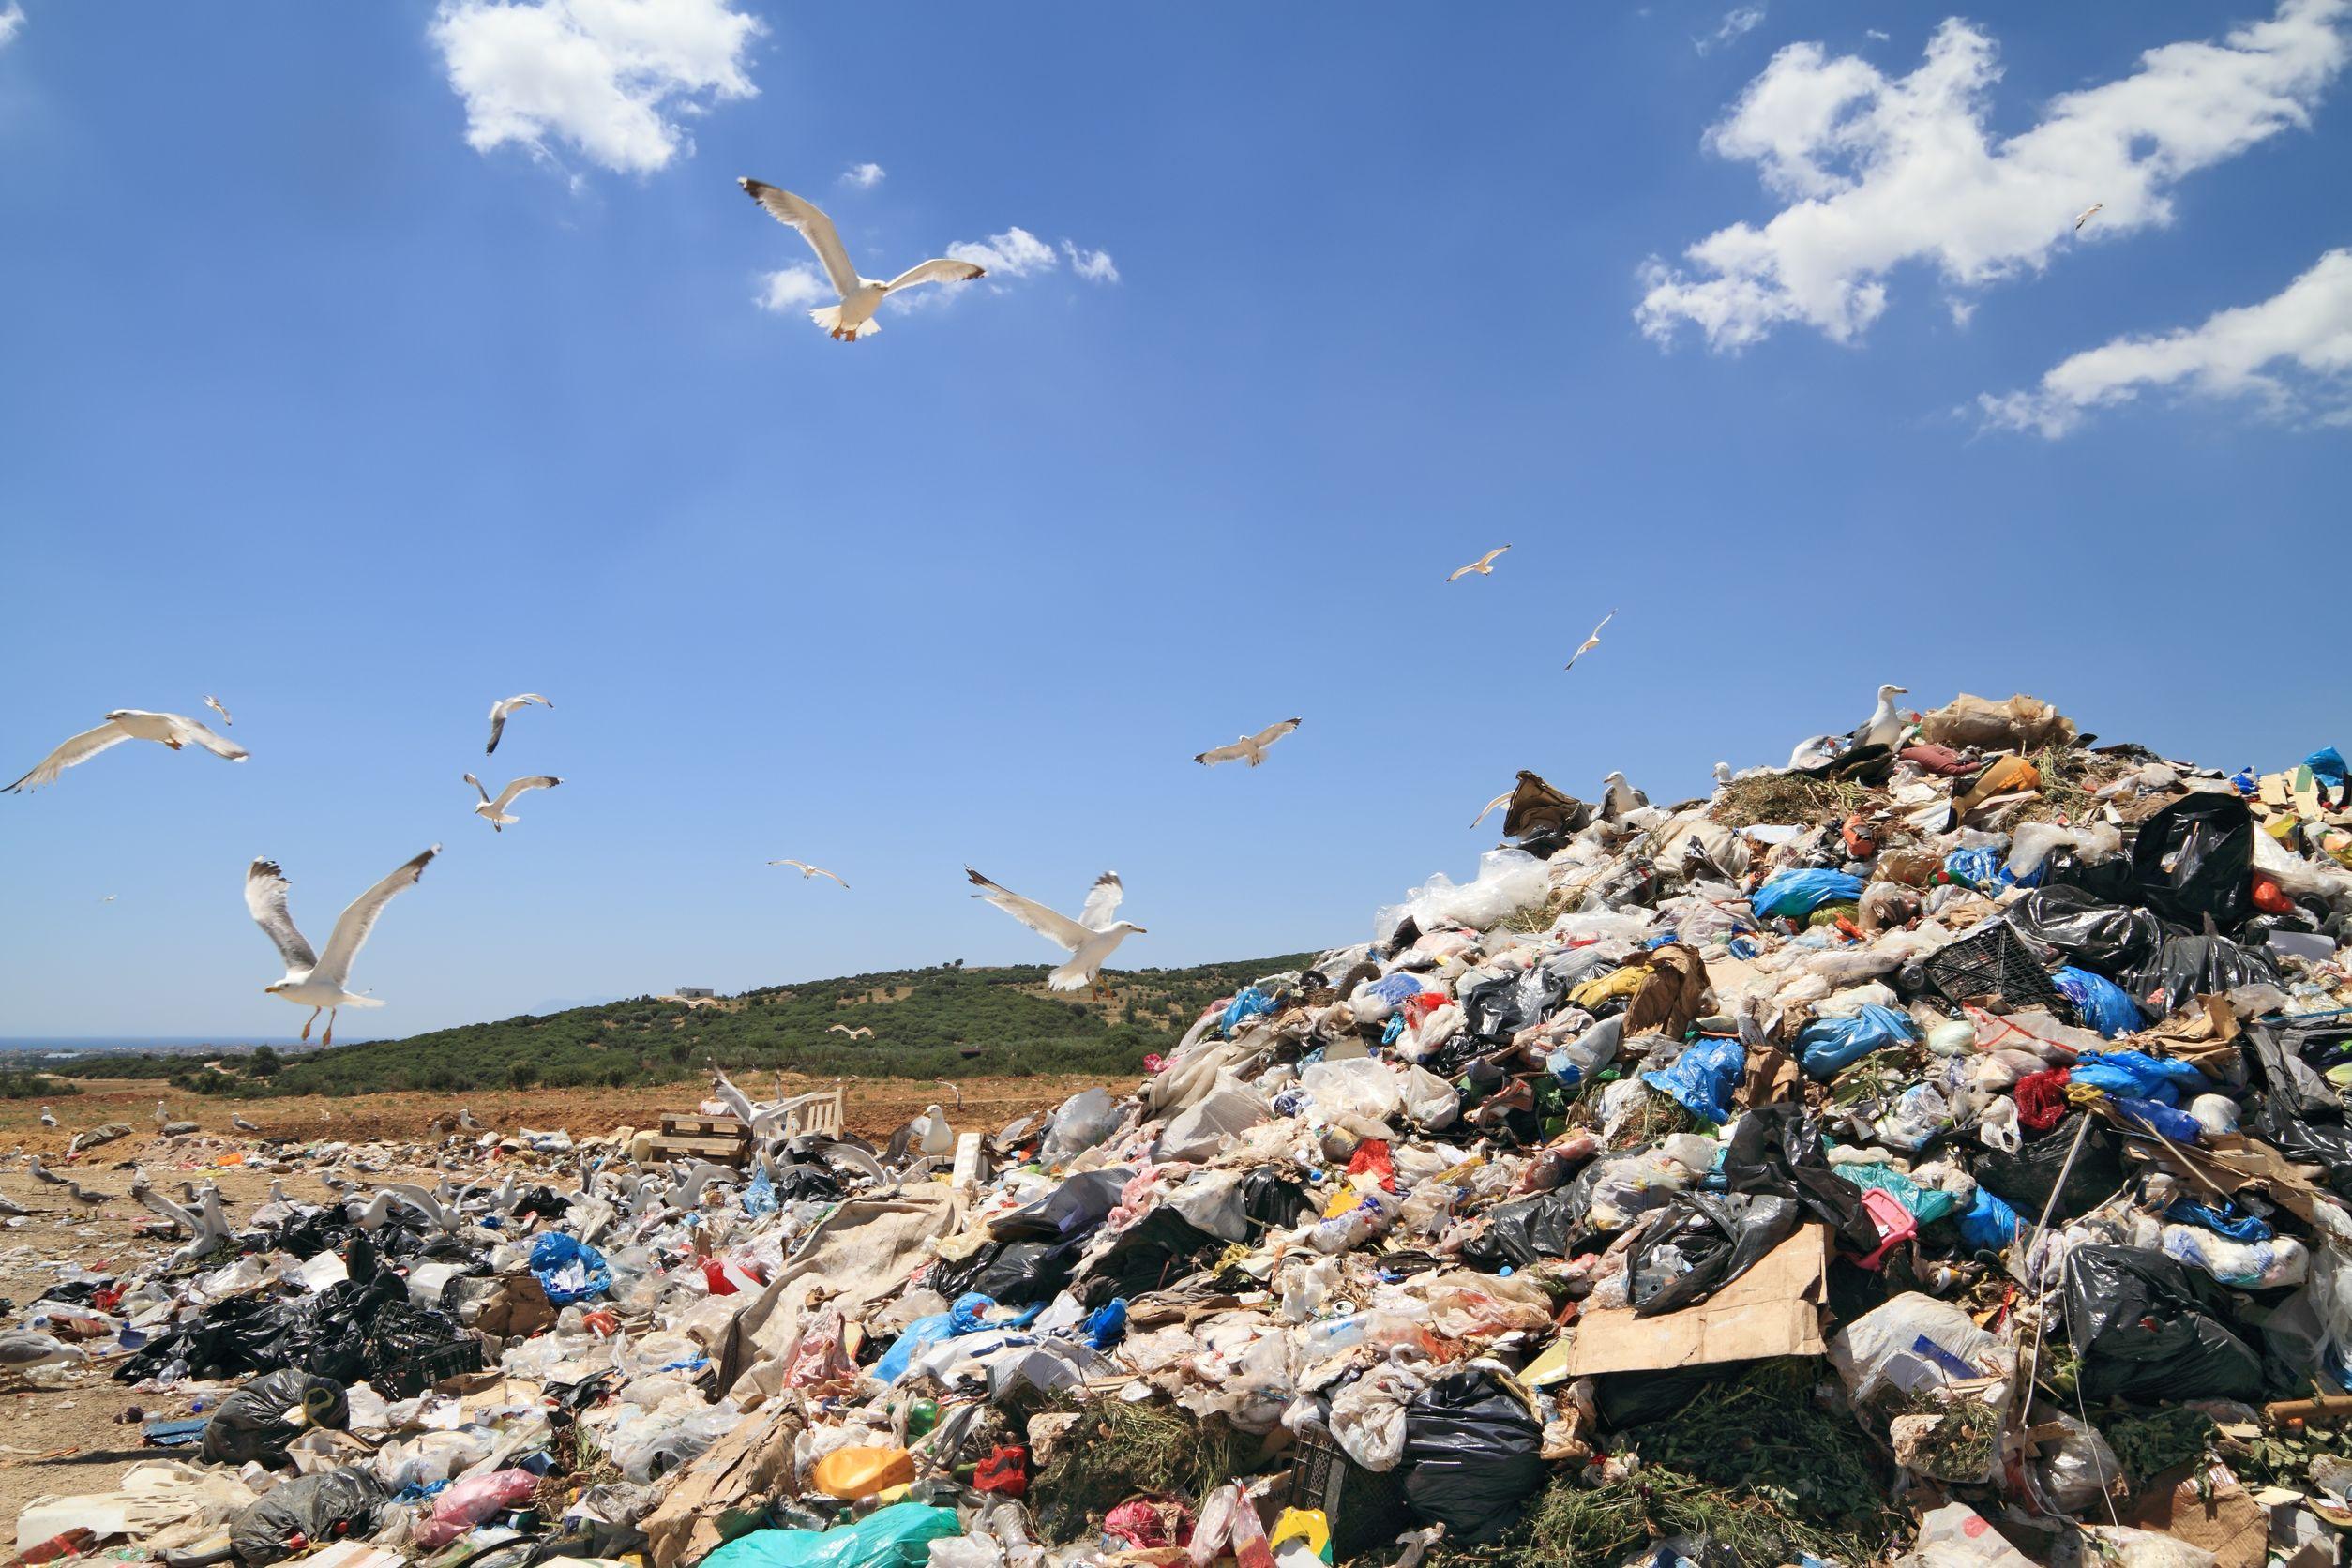 Plastic bag ban won't help the environment